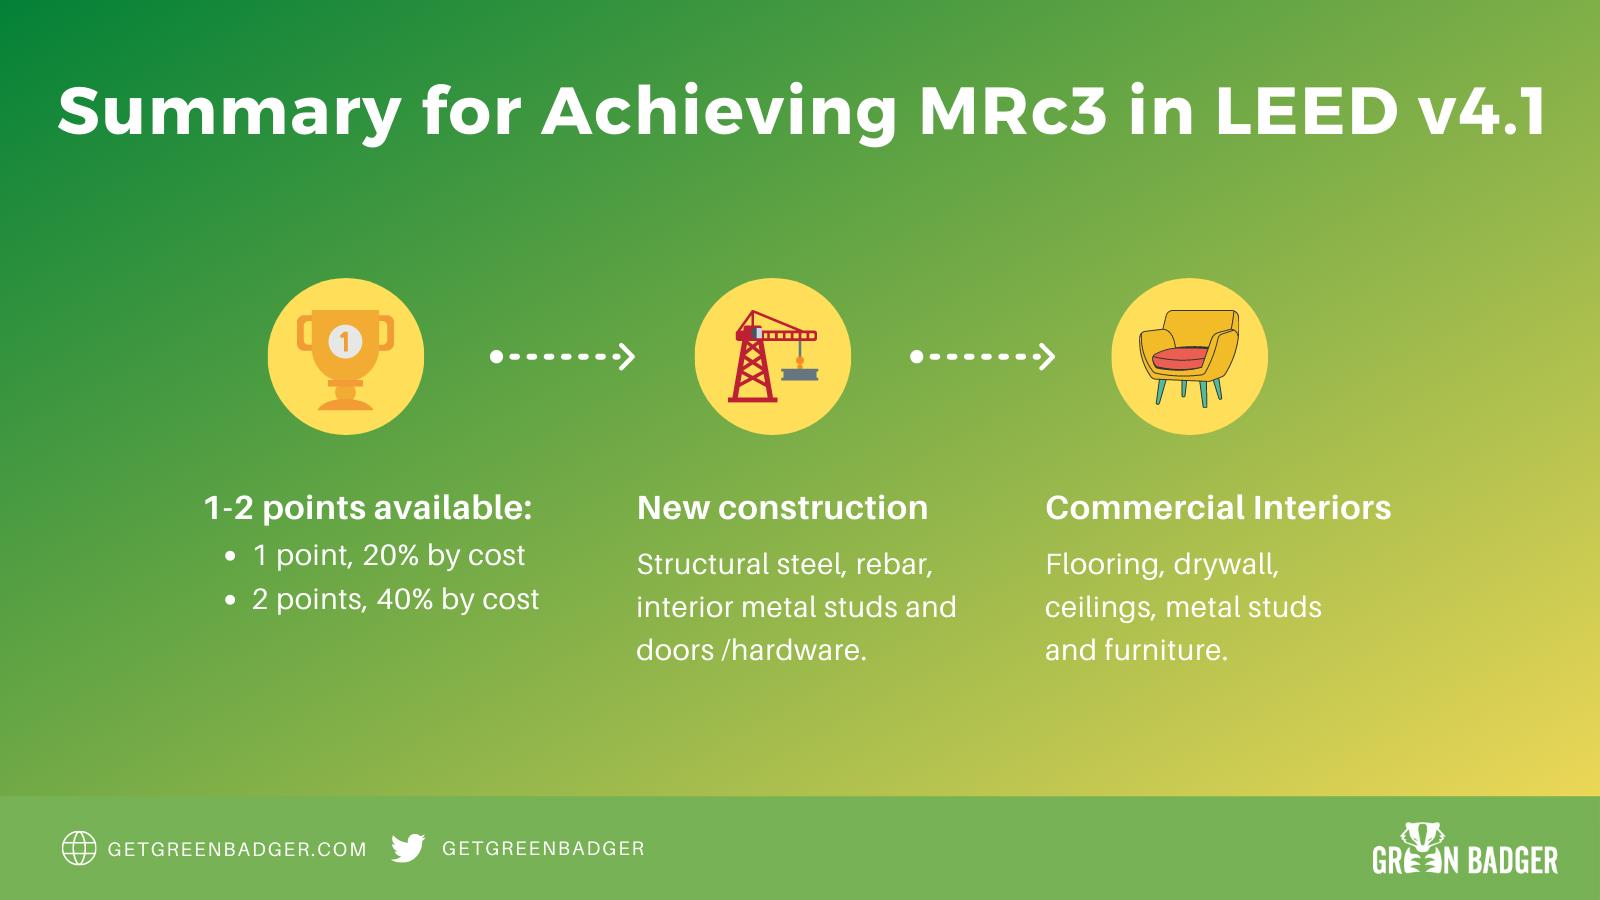 mrc3-strategies-LEEDv4